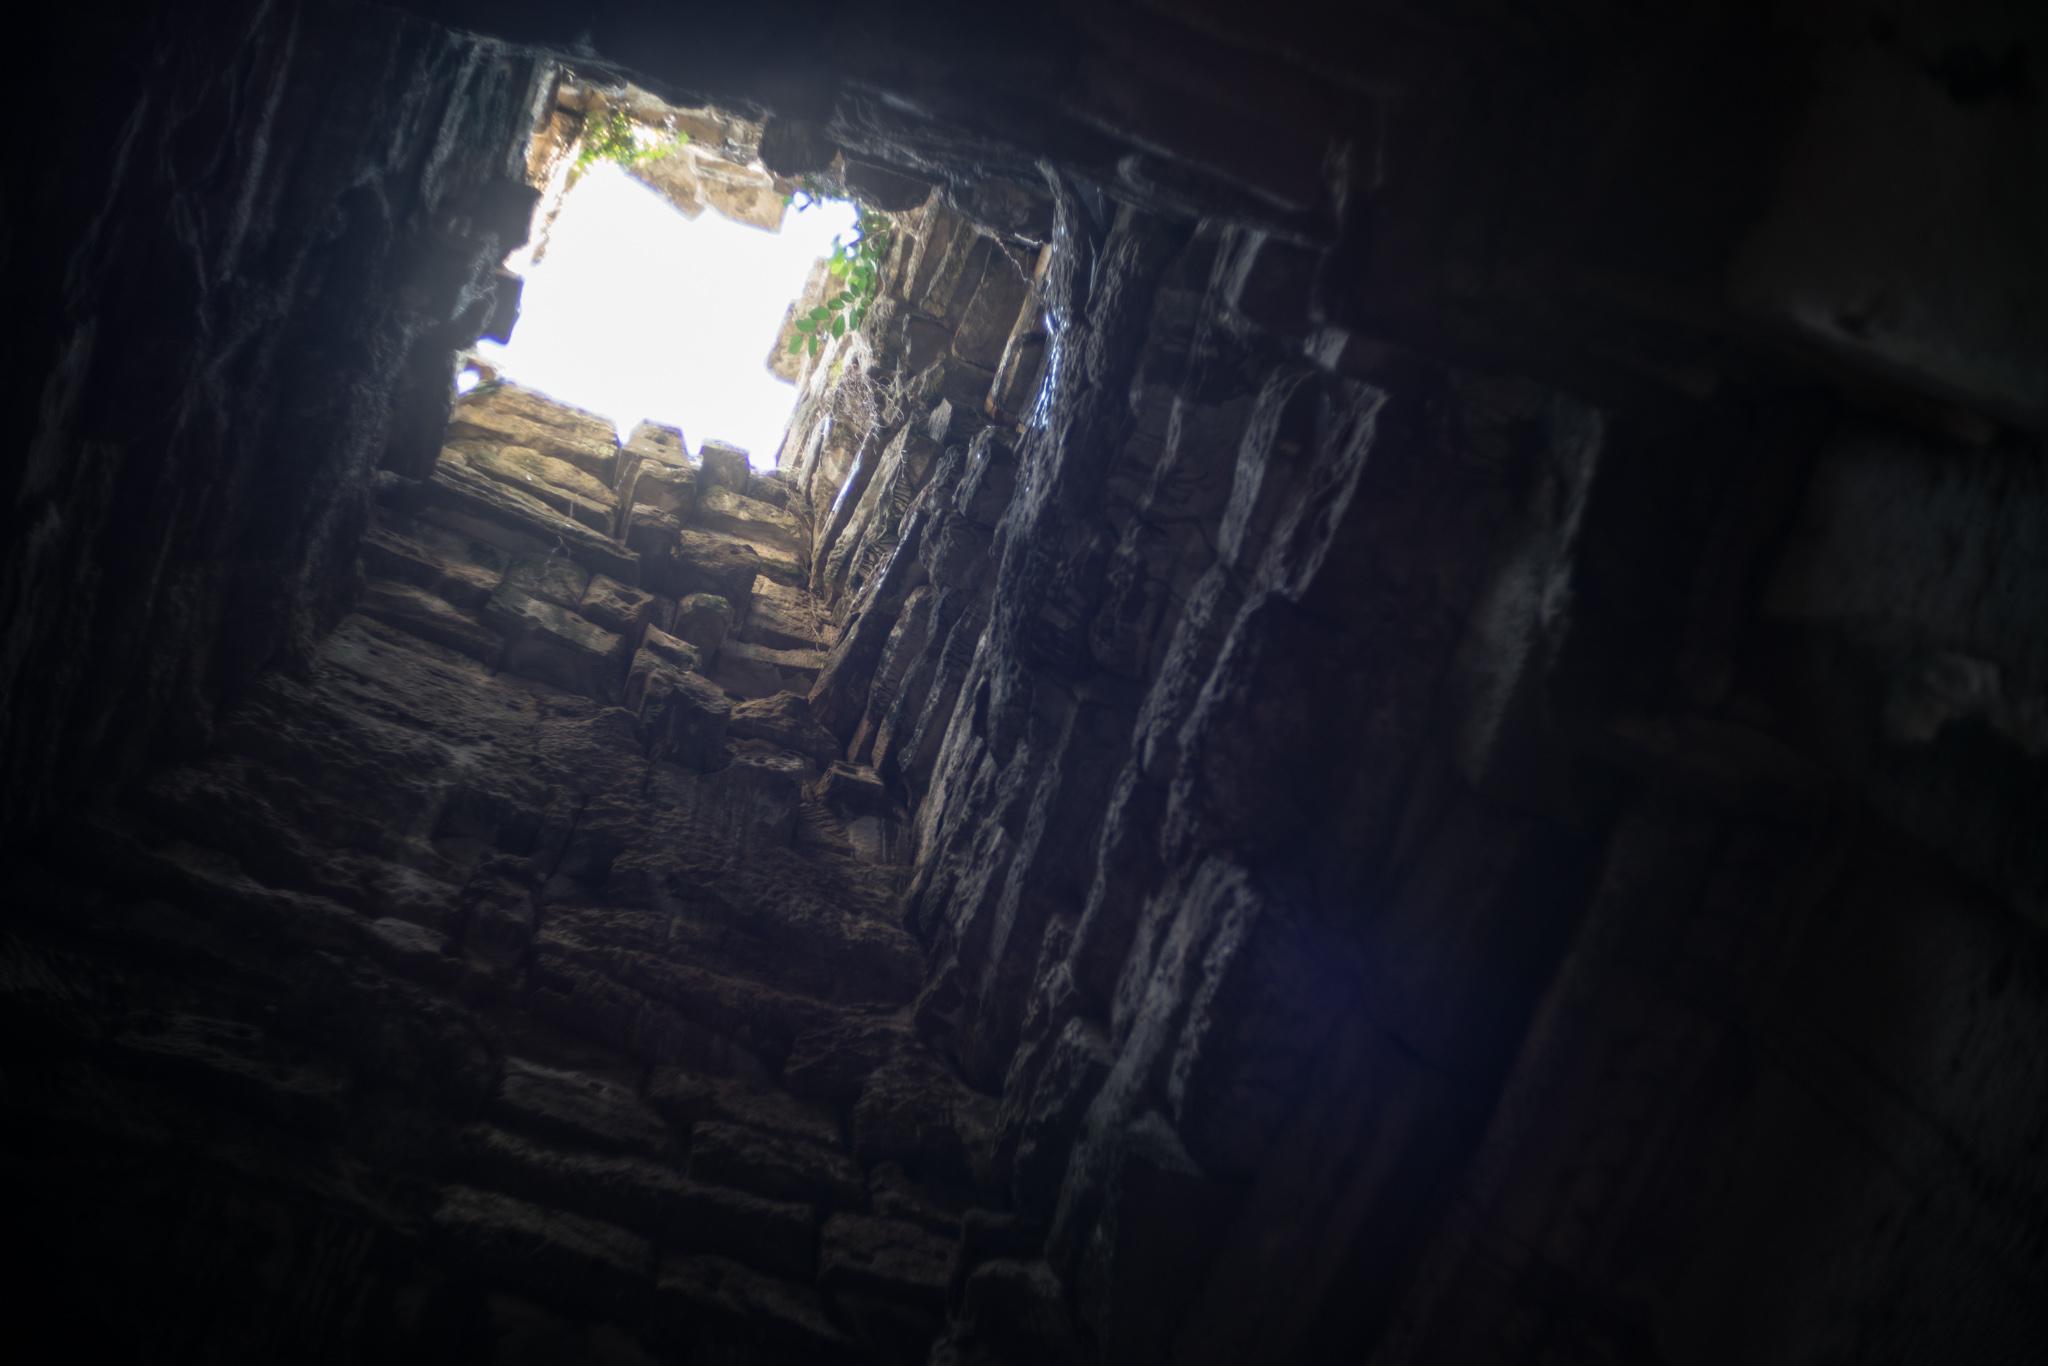 January 2017, Ta Prohm (ប្រាសាទតាព្រហ្ម), Angkor (អង្គរ), Kingdom of Cambodia (ព្រះរាជាណាចក្រកម្ពុជា).